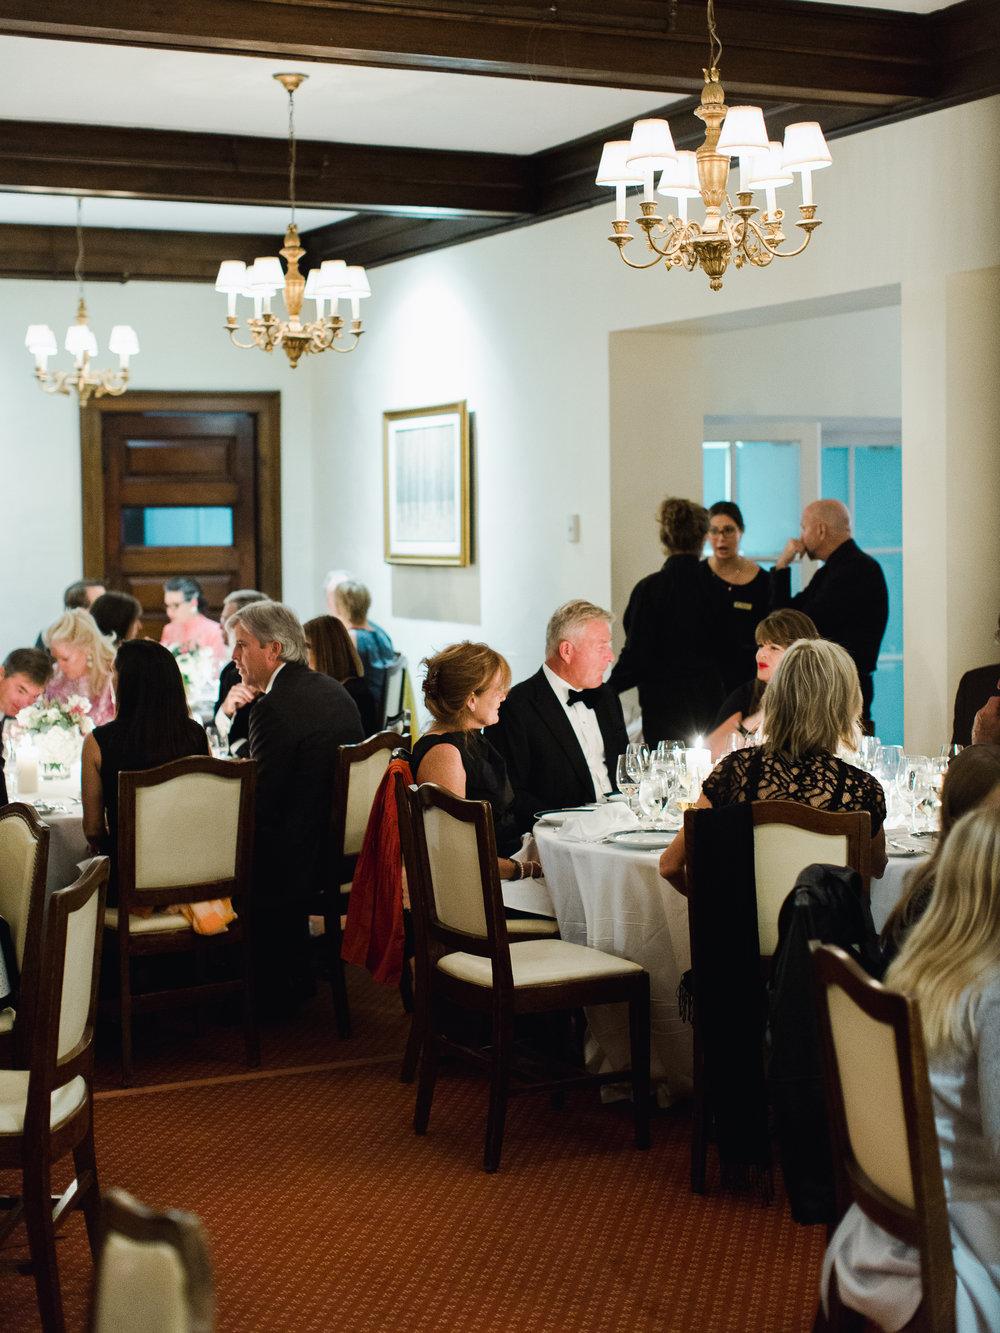 0742-Geneva-Ian-Wedding-Toronto Golf Club-When He Found Her-TorontoPhotographer.jpg